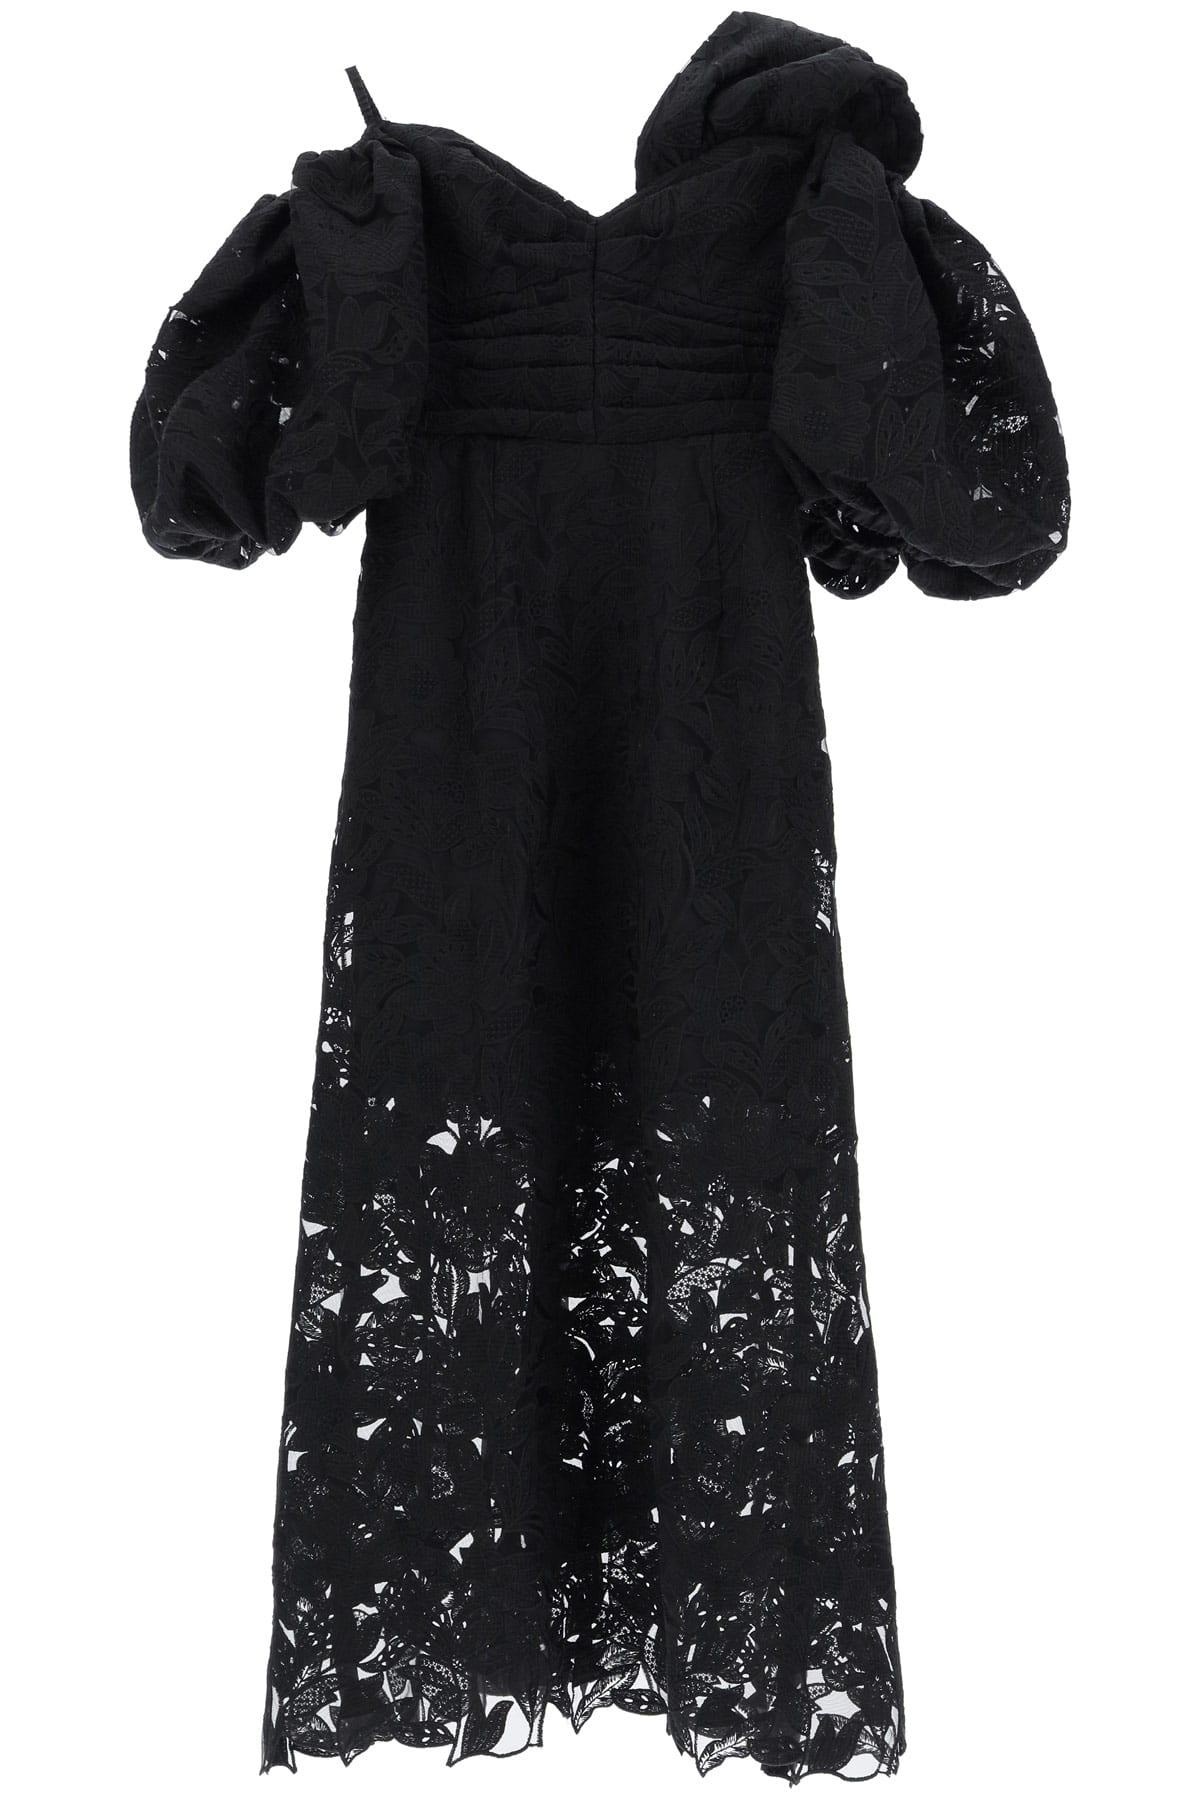 SELF PORTRAIT MIDI LACE DRESS 8 Black